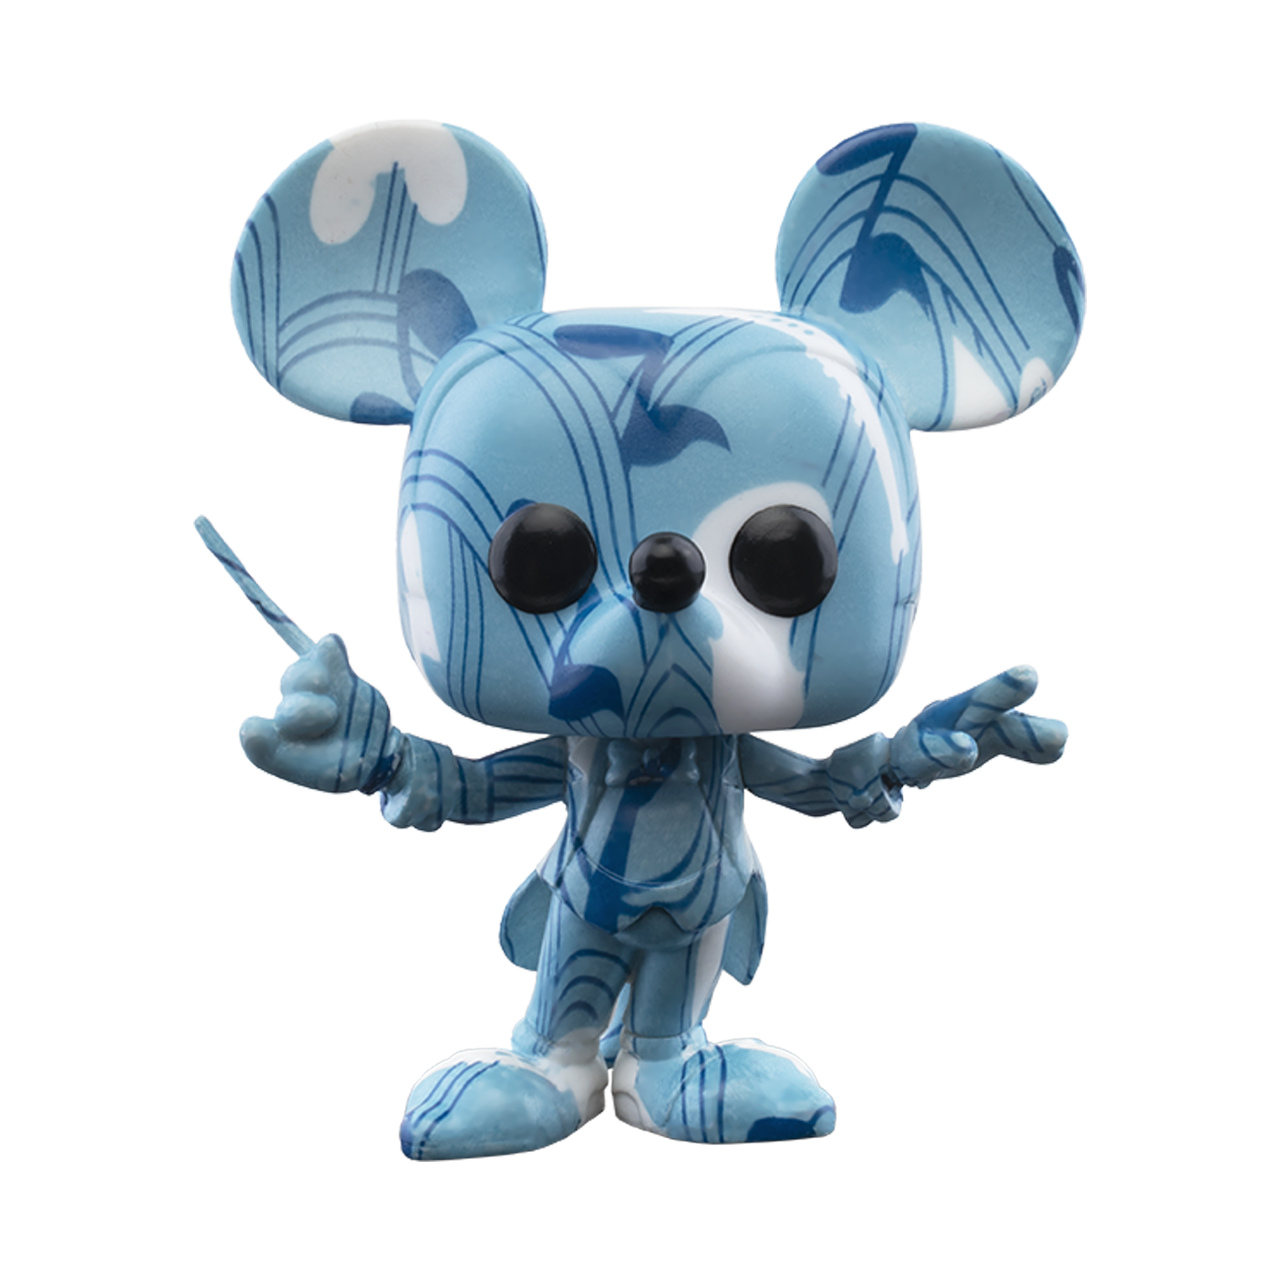 Funko Pop! Maestro Conductor Mickey Mouse Disney Art Series Edição Especial Special Edition #22 - Funko